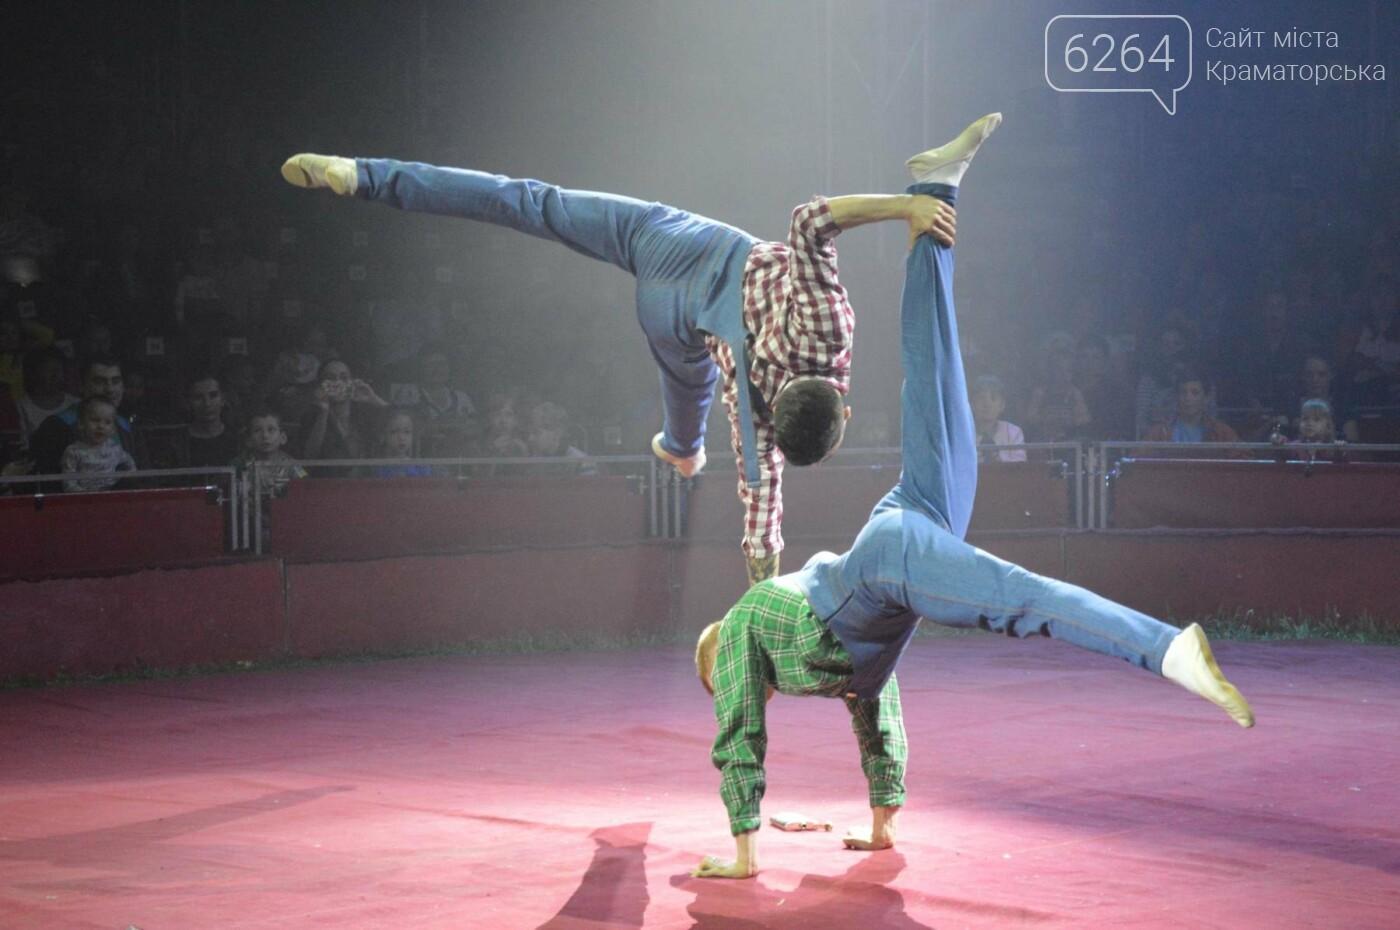 Новое шоу цирка «Кобзов» произвело фурор в Краматорске, фото-1